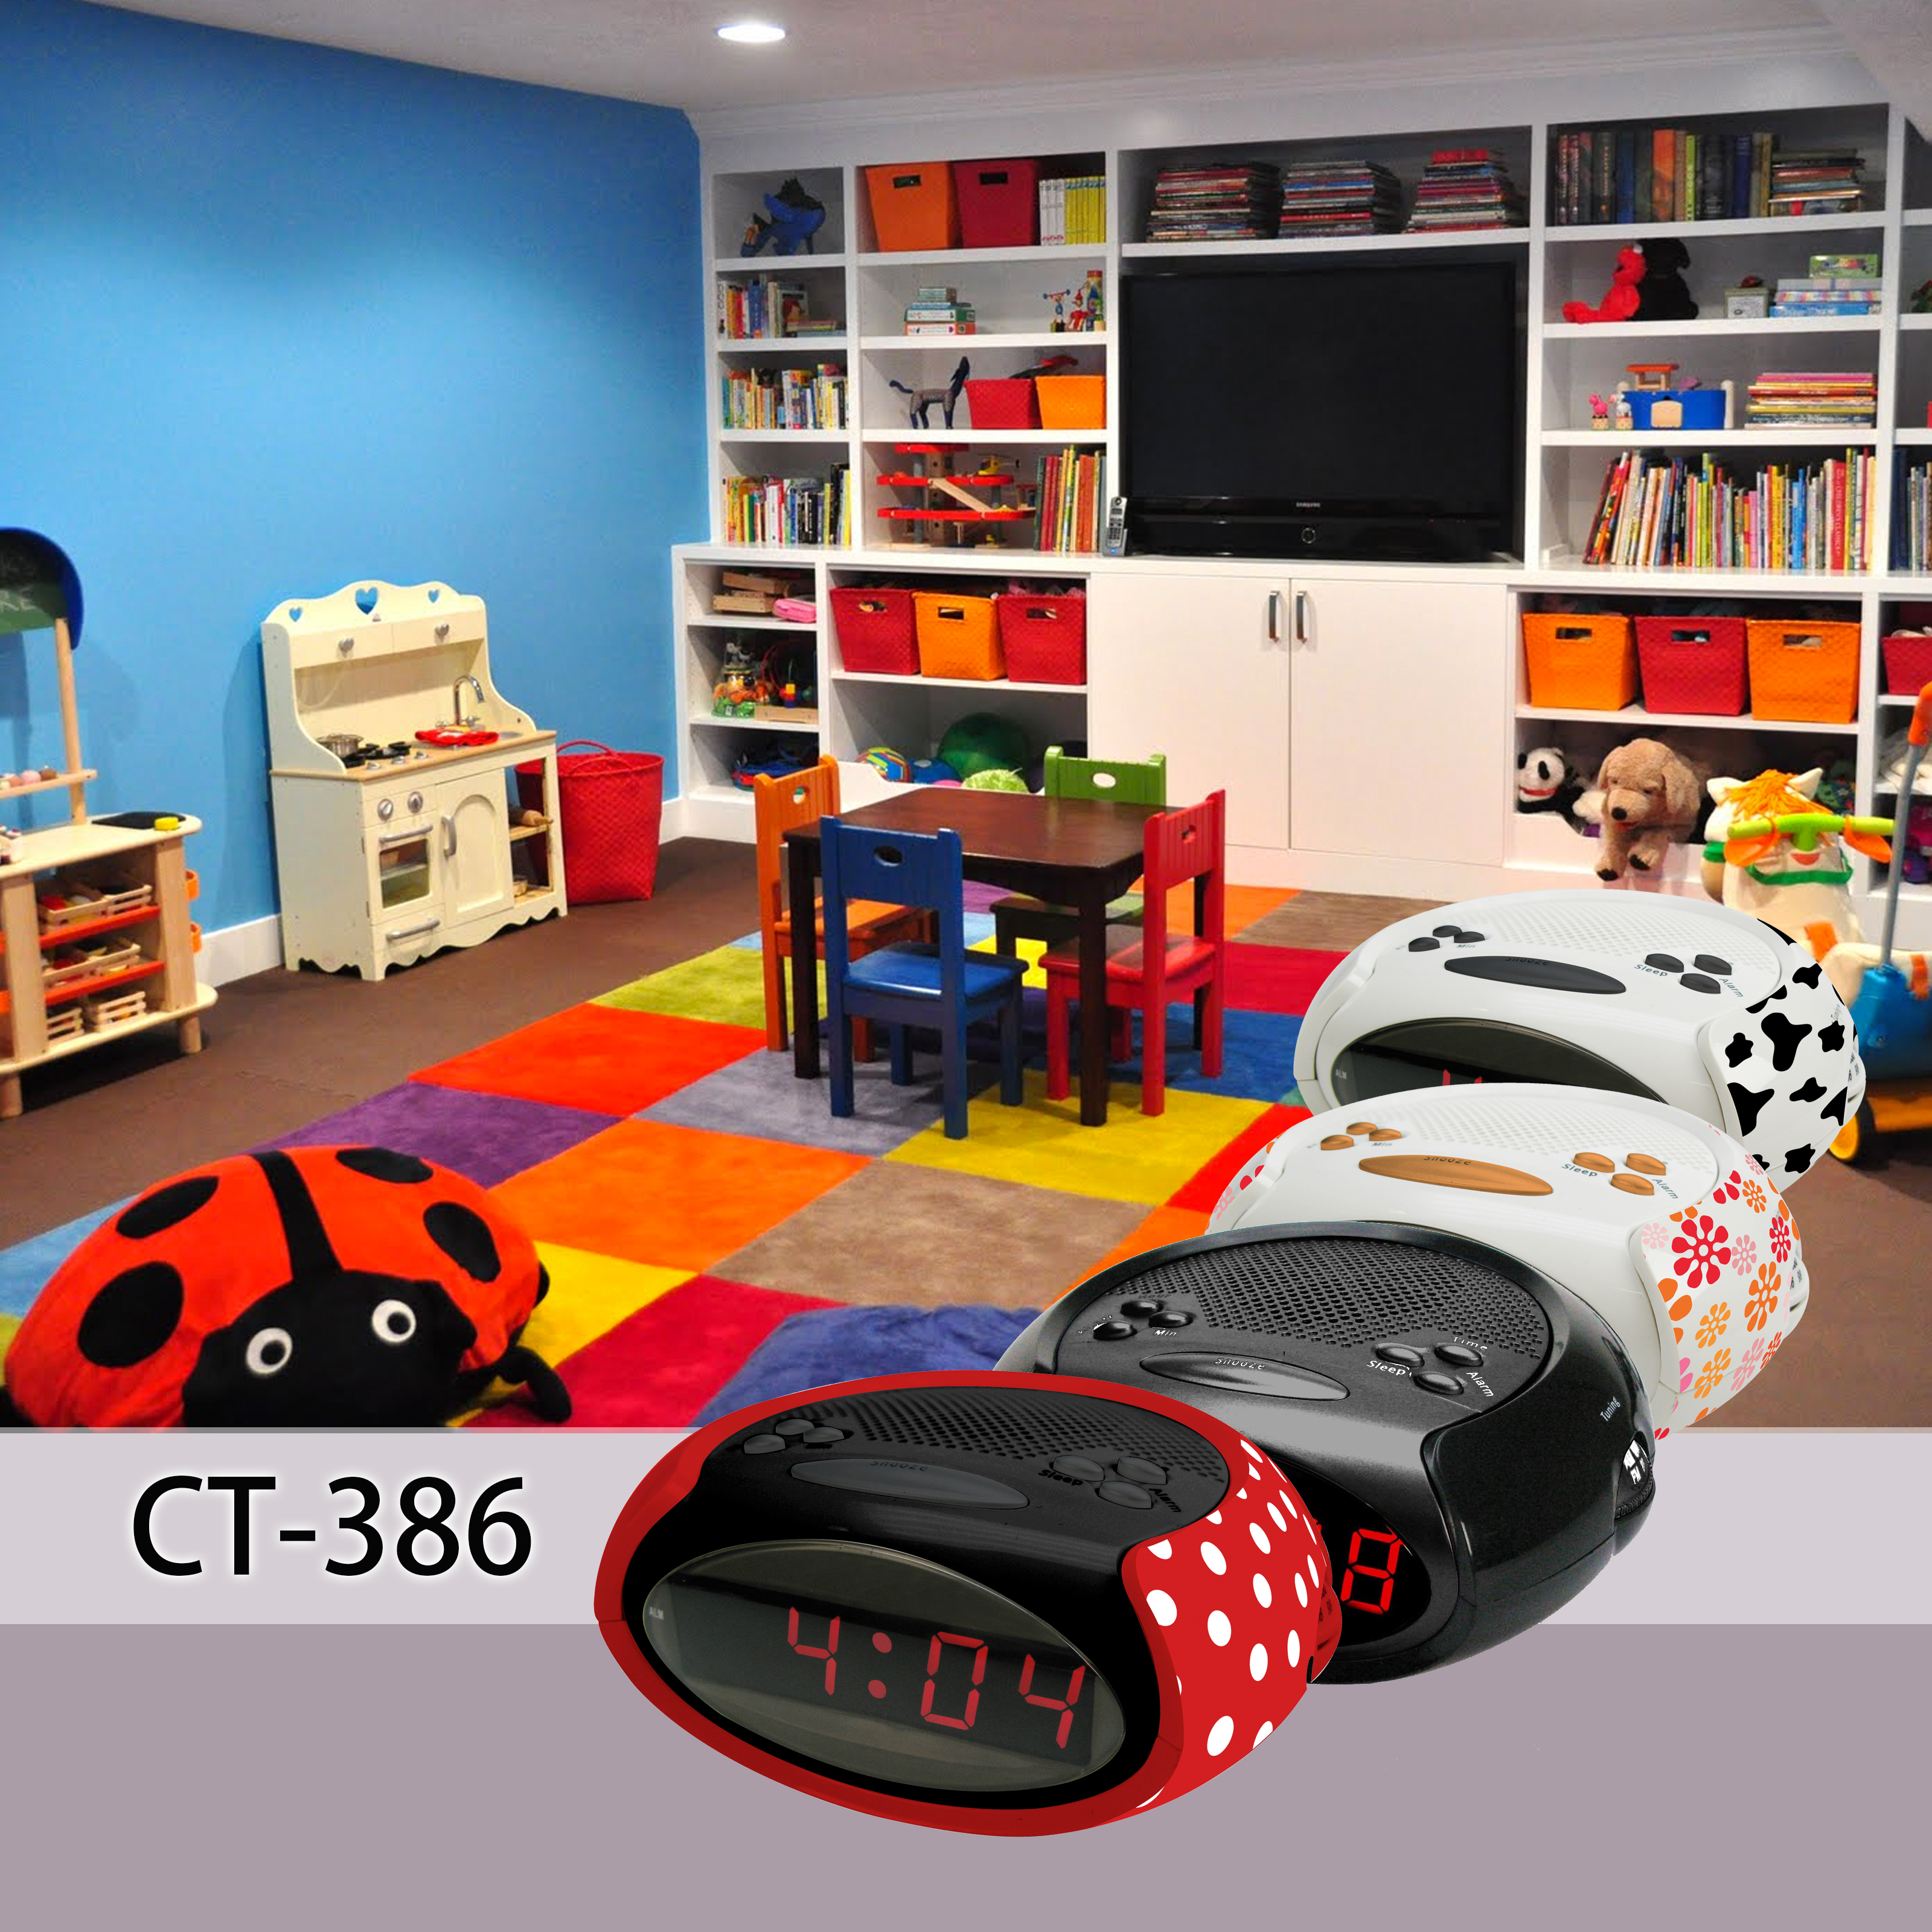 CT-386 playroom.jpg